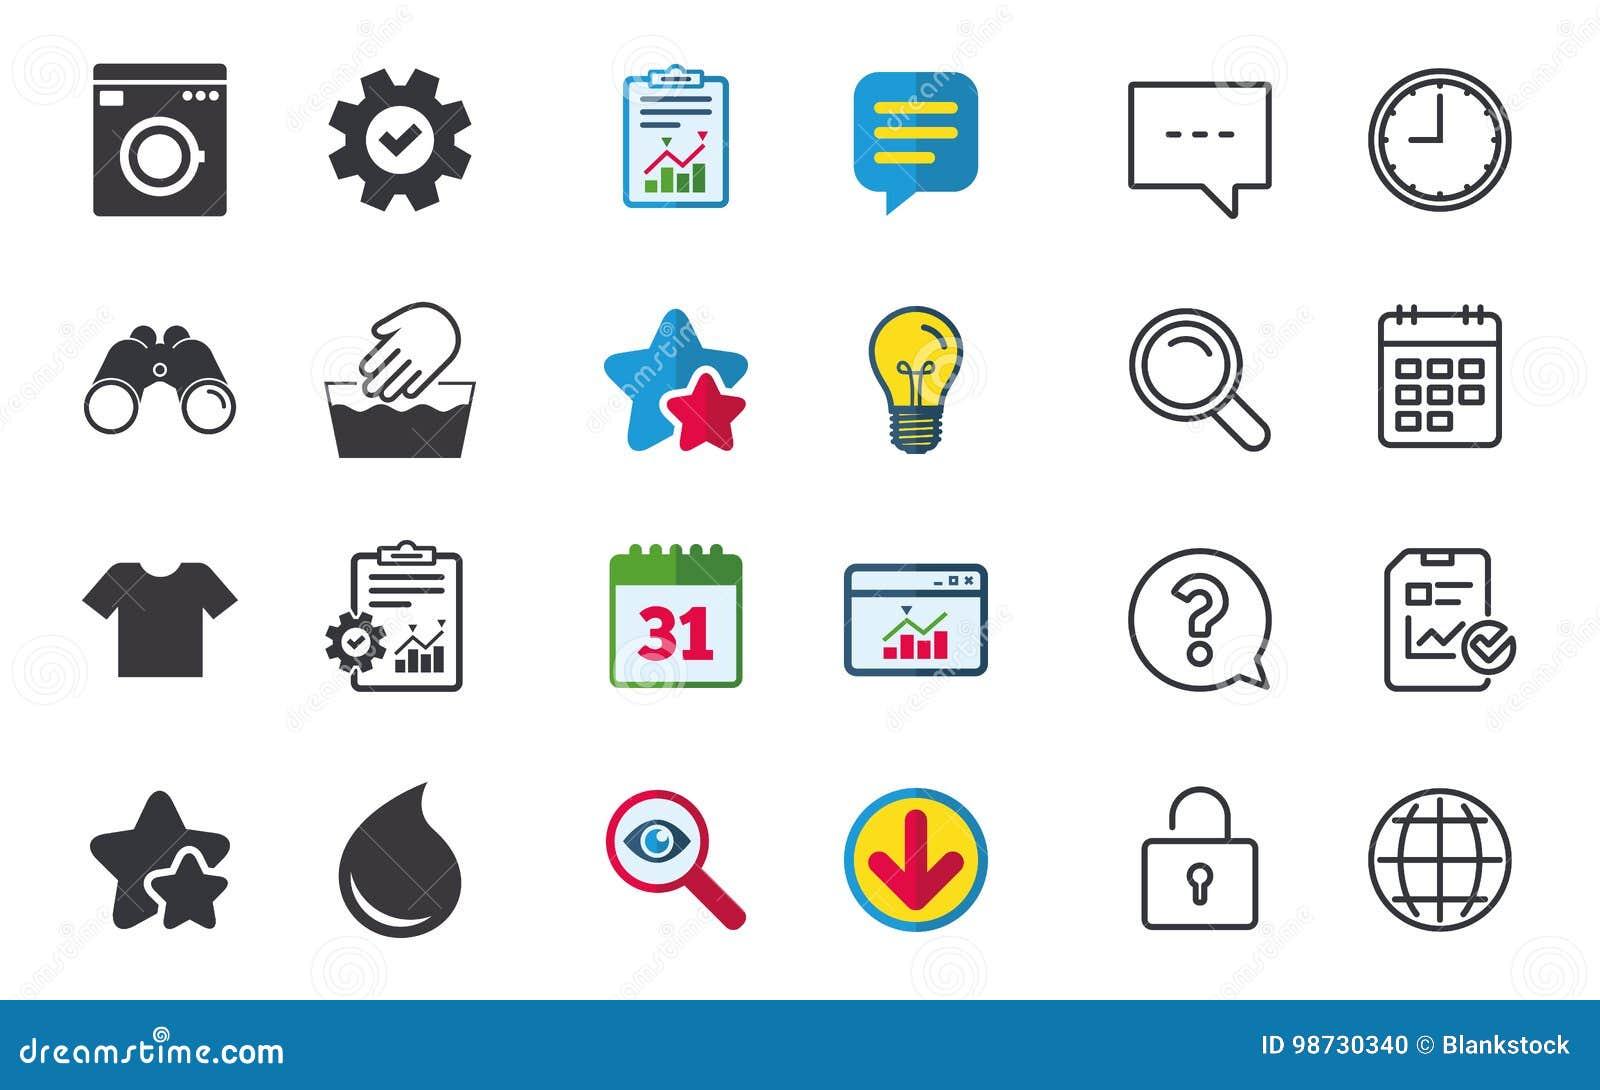 Wash Icon Not Machine Washable Symbol Stock Vector Illustration